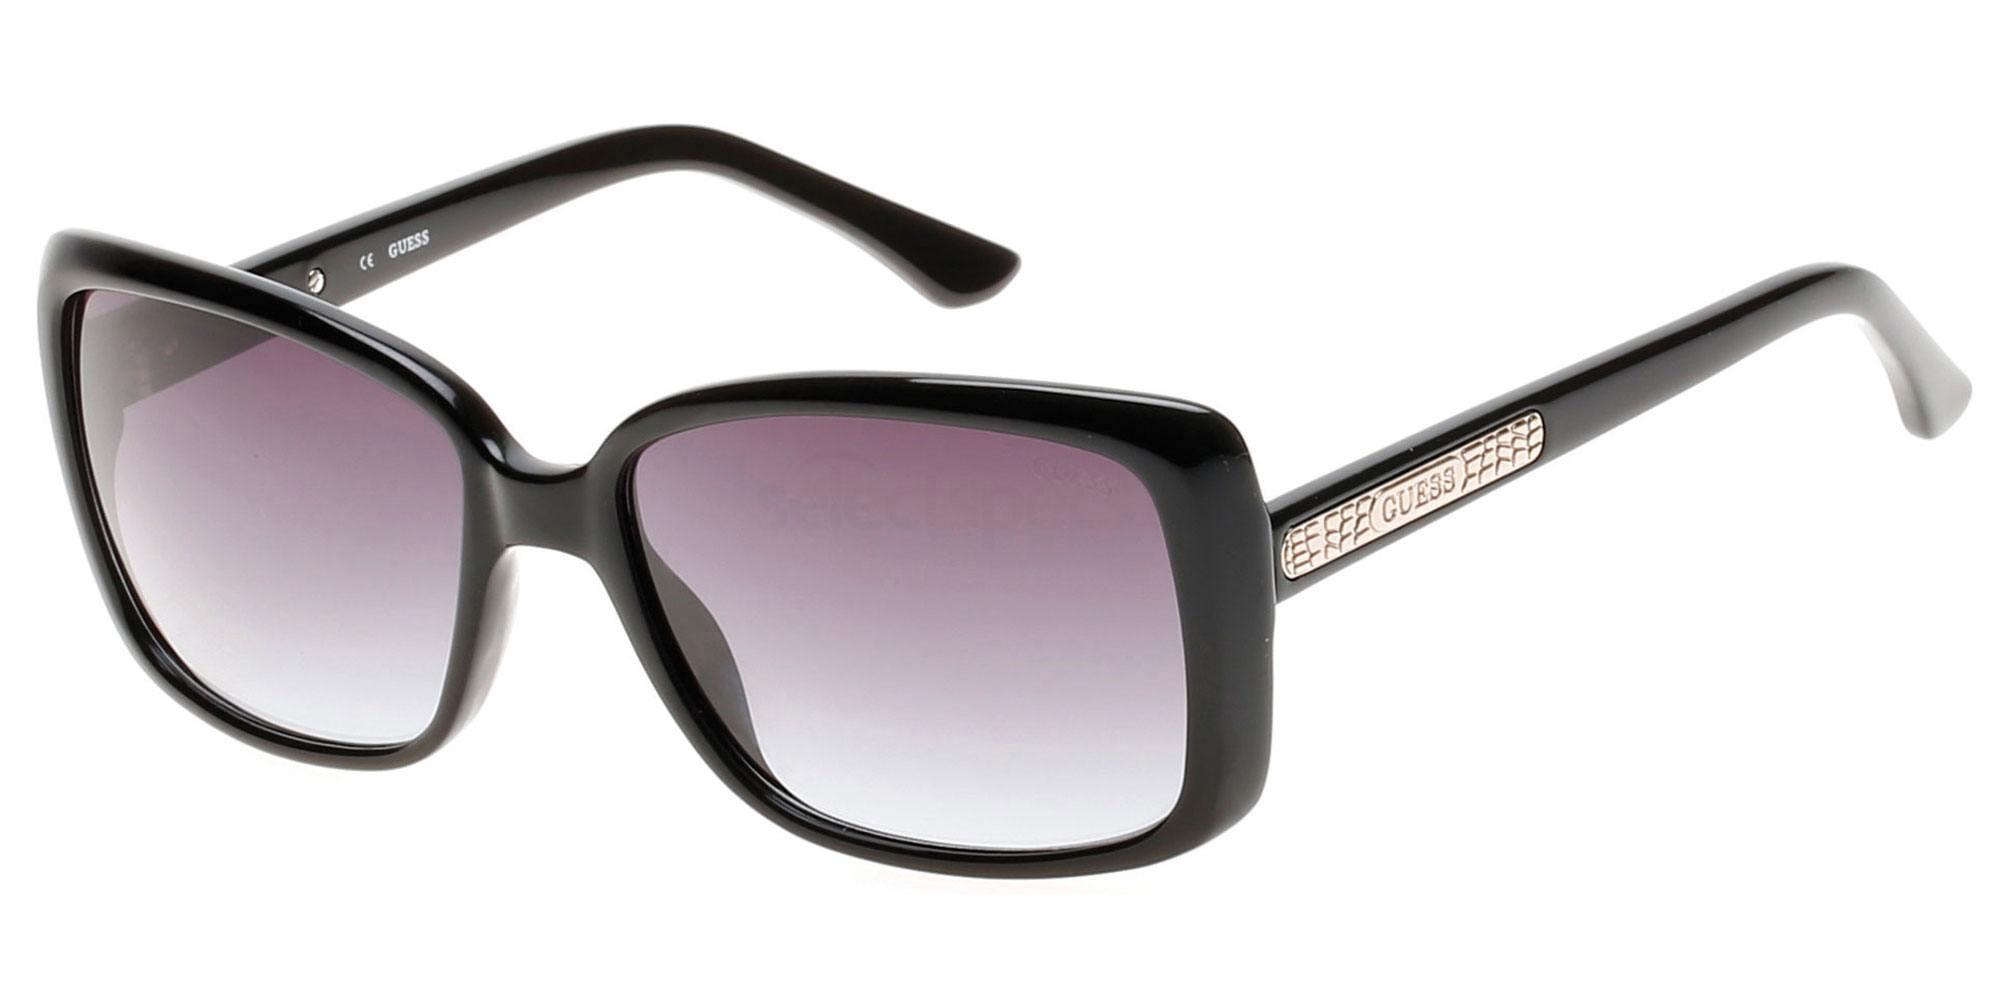 01B GU7336 Sunglasses, Guess